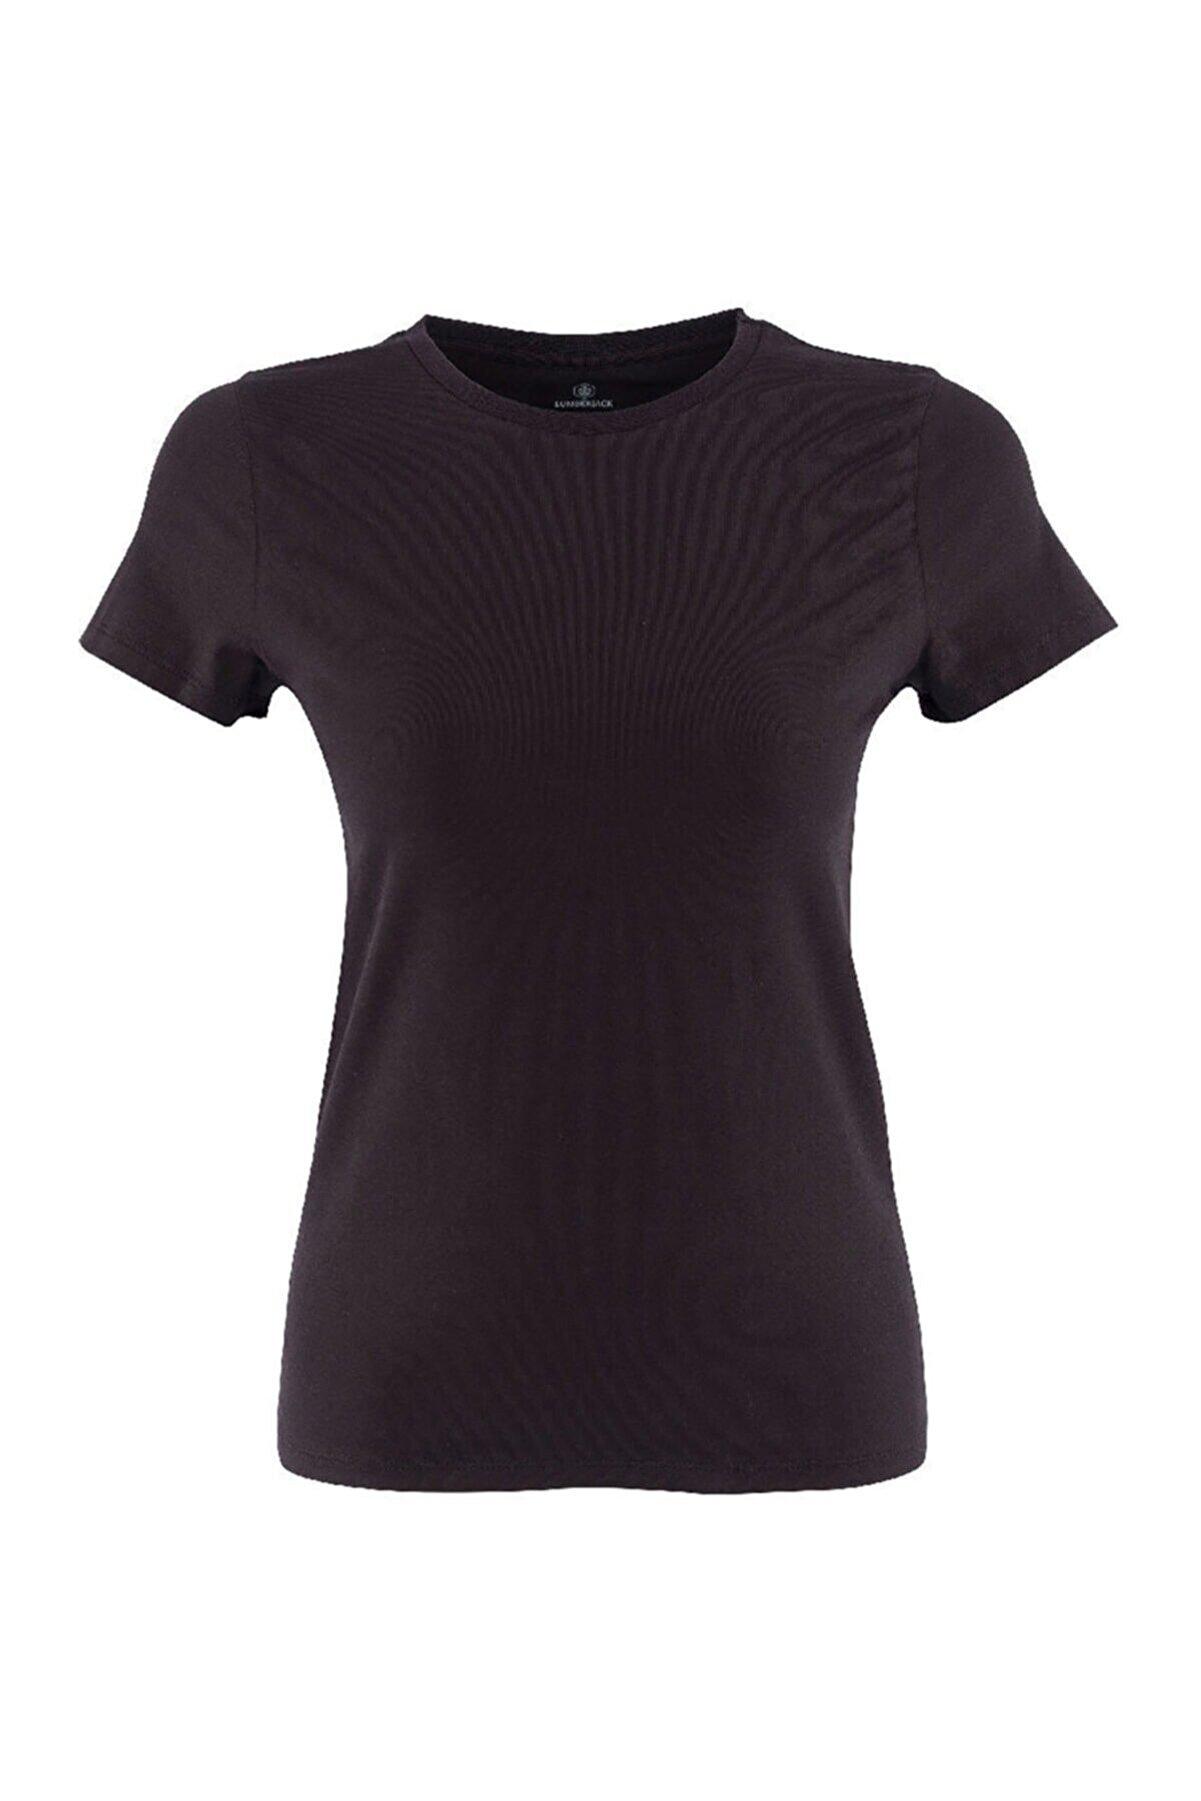 Lumberjack CT129 BASIC C NECK T-SHIR Siyah Kadın T-Shirt 100581832